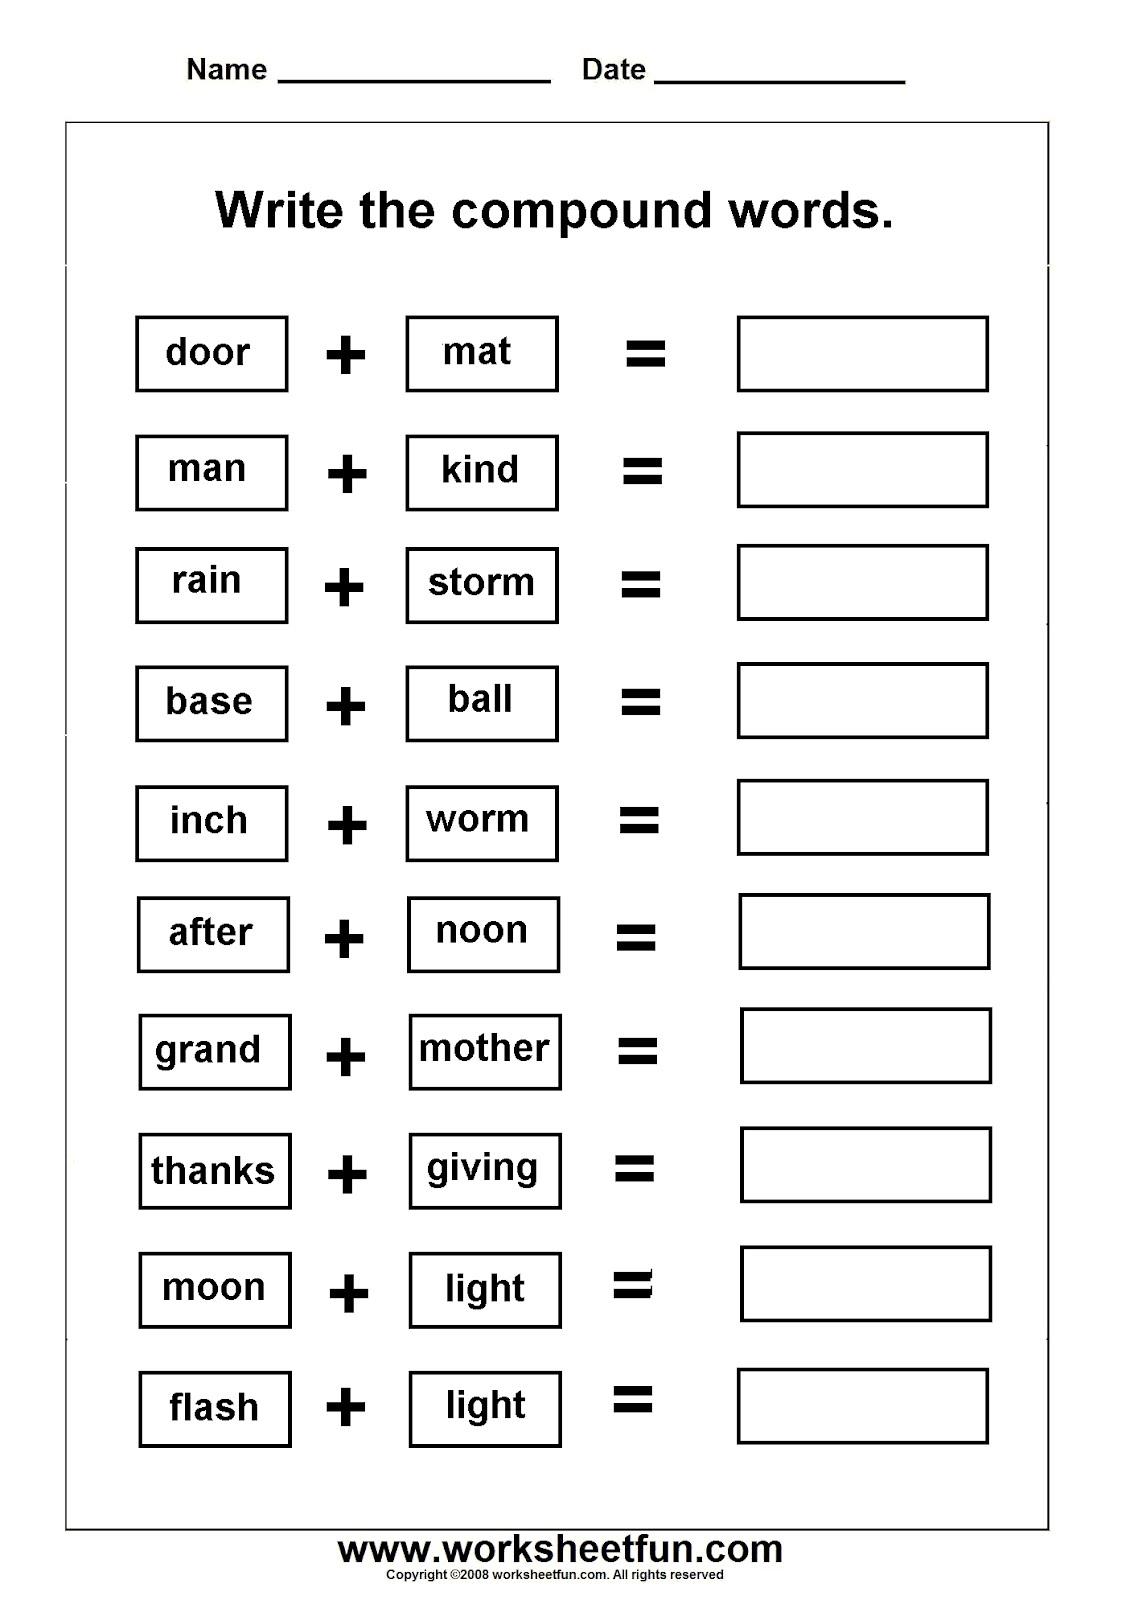 Printable Compound Word Worksheets The Best Worksheets Image